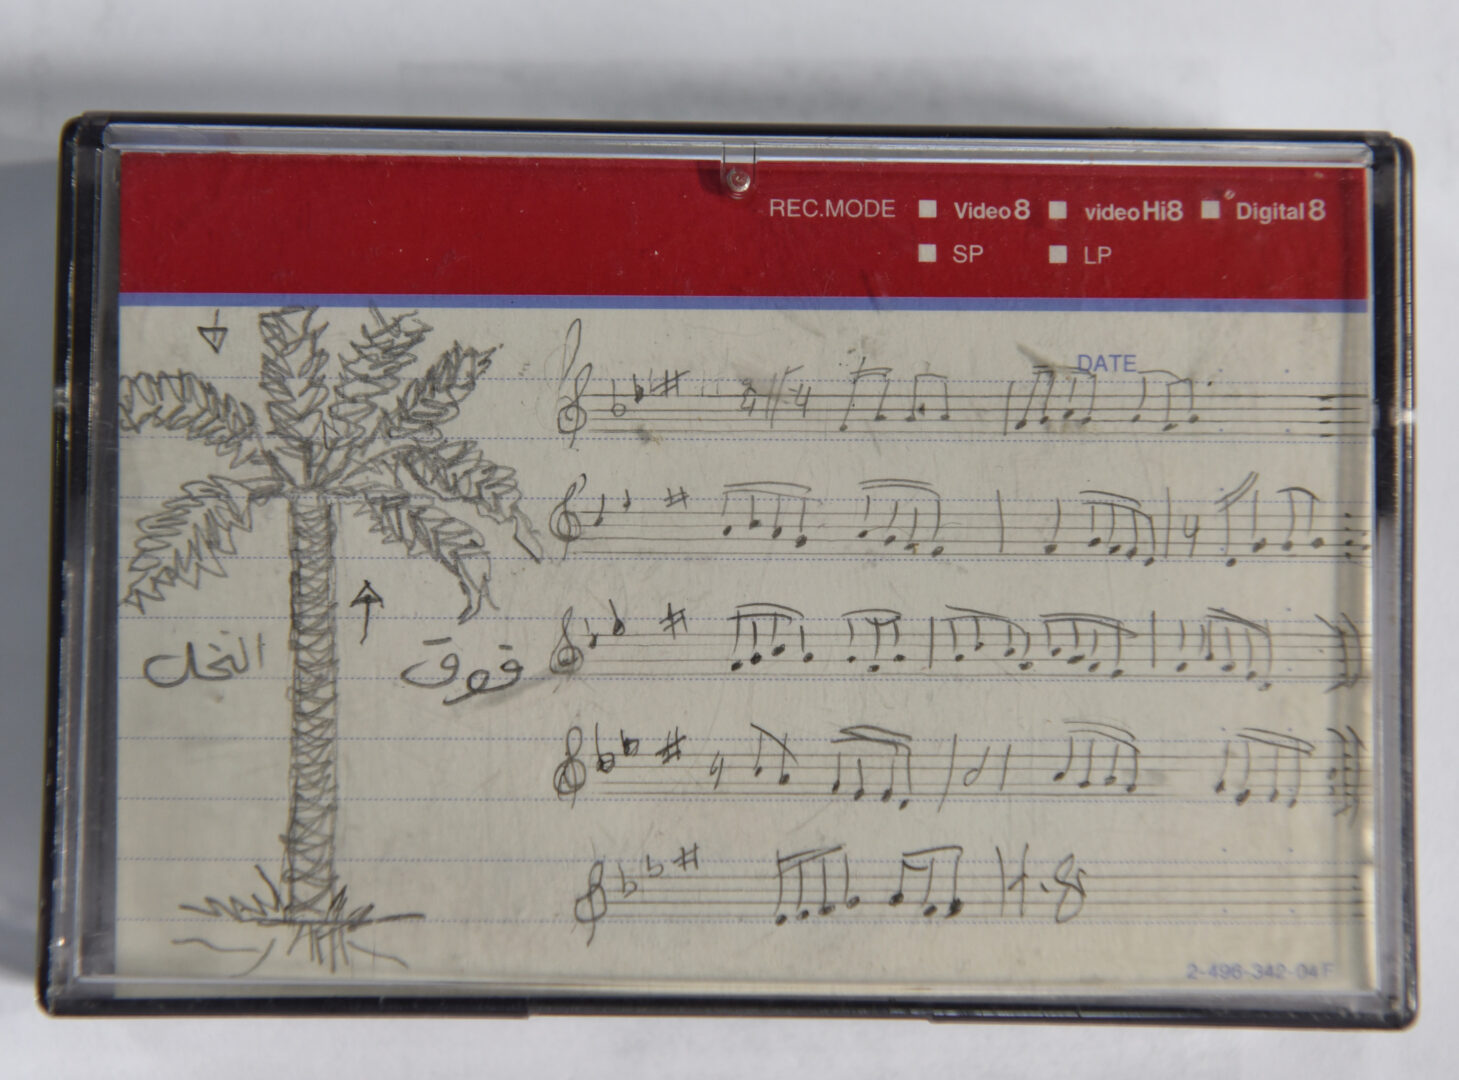 Music of the Bush era, 2017